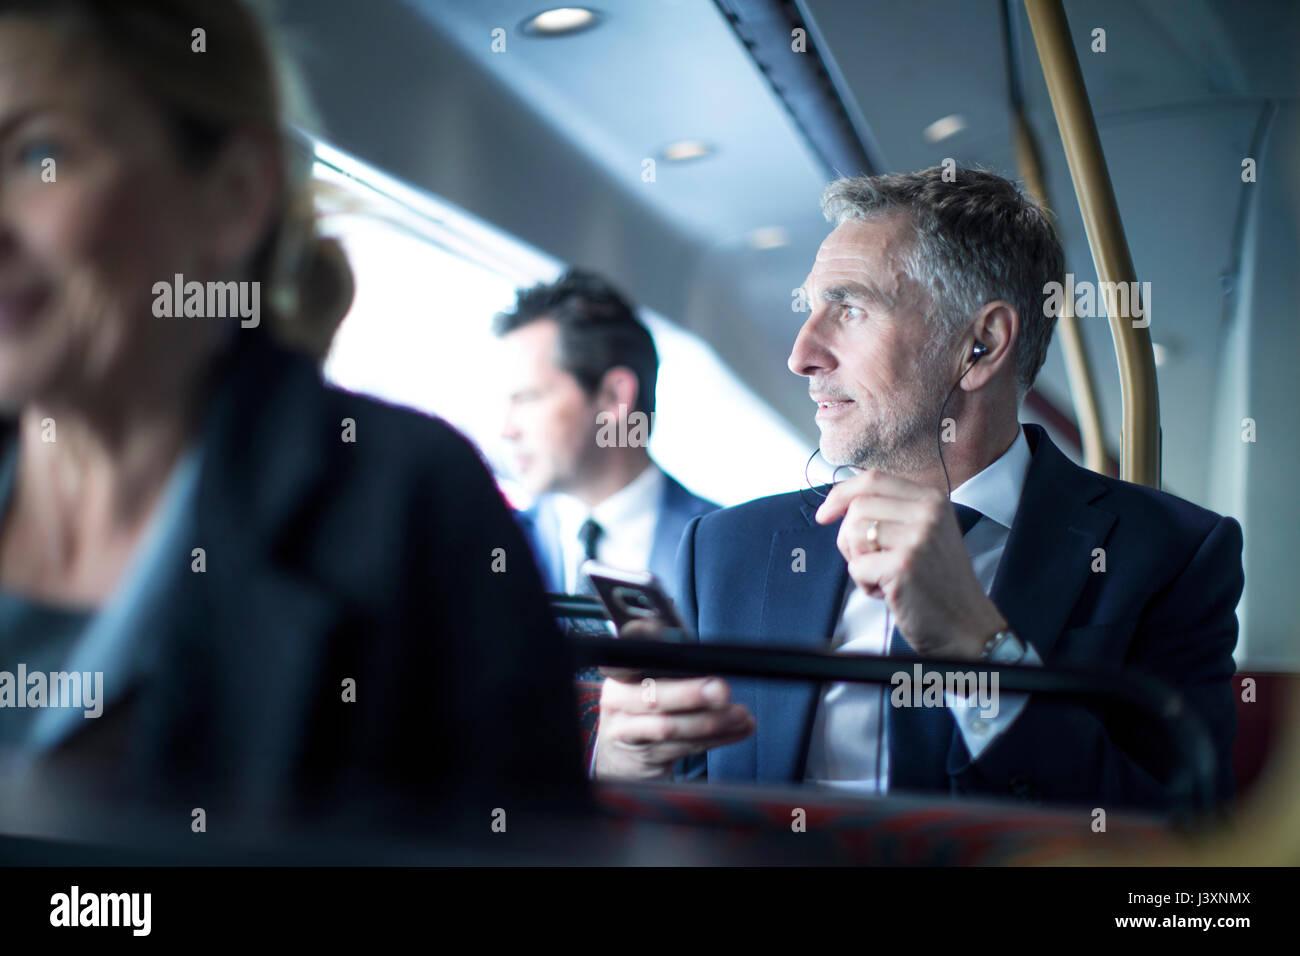 Businessman listening to smartphone earphones on double decker bus - Stock Image